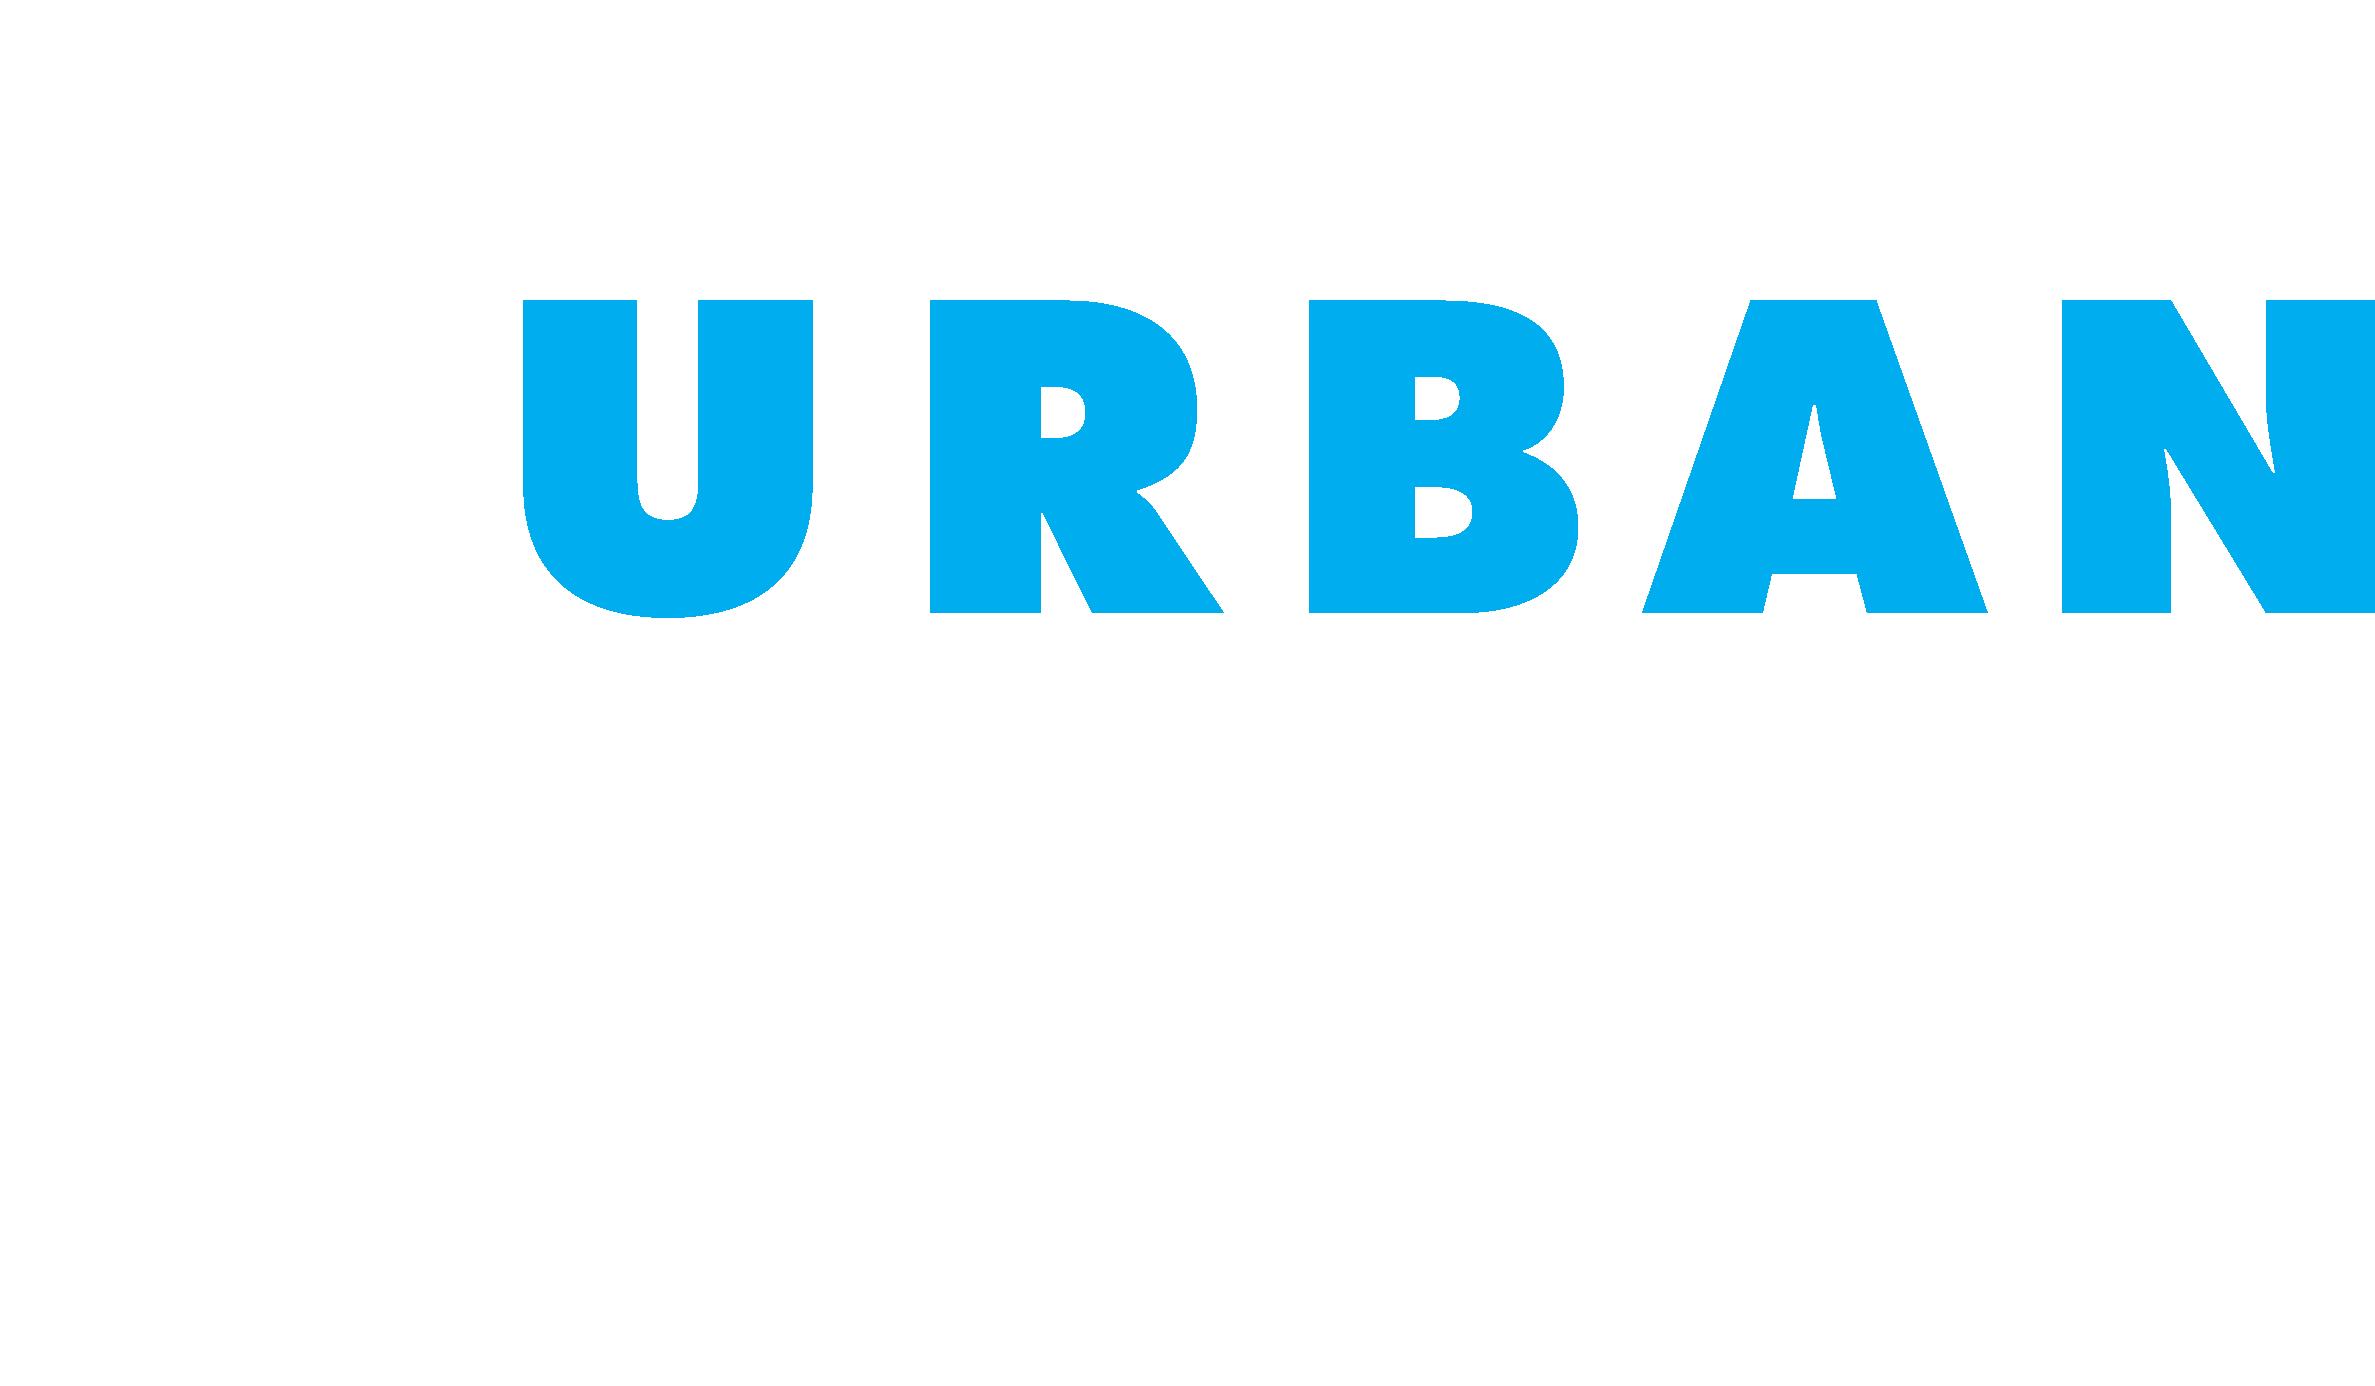 logo revblue trans png build your own pension plan